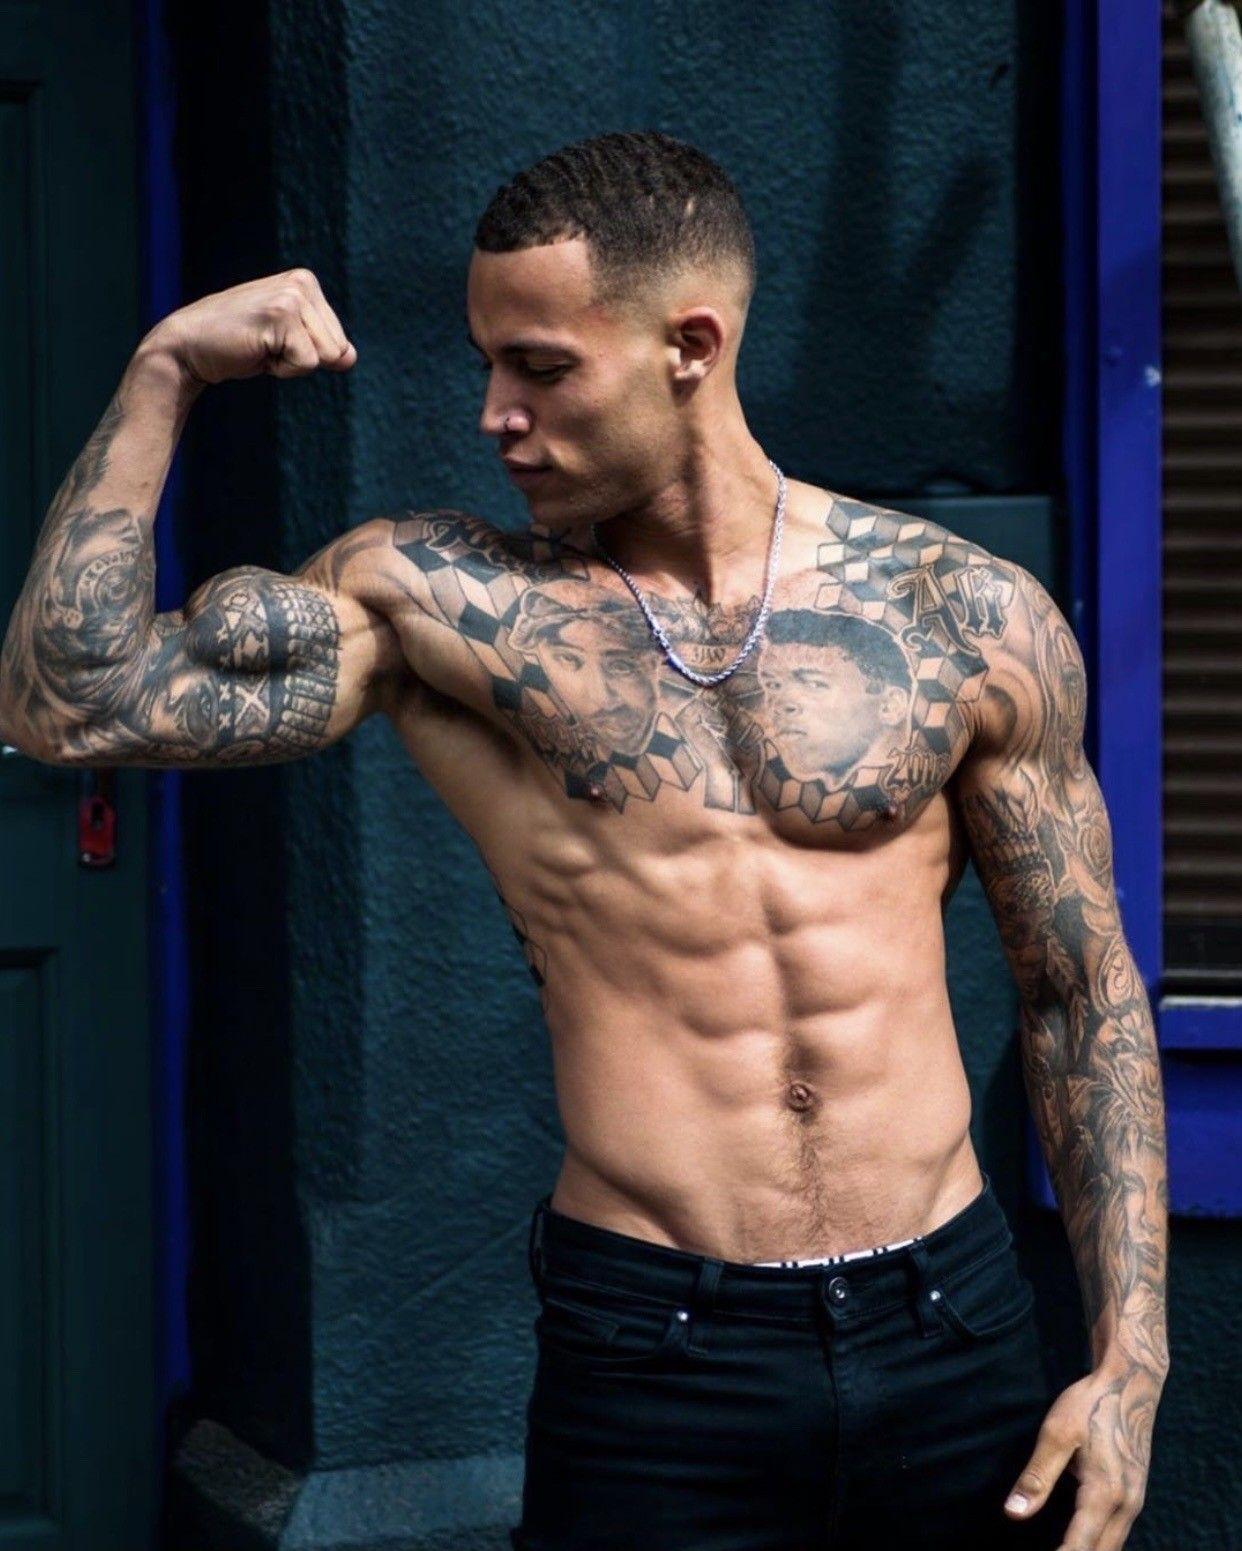 Pin By Viom Wian On Tatuajes Iv Fitness Inspiration Muscle Hunks Workout